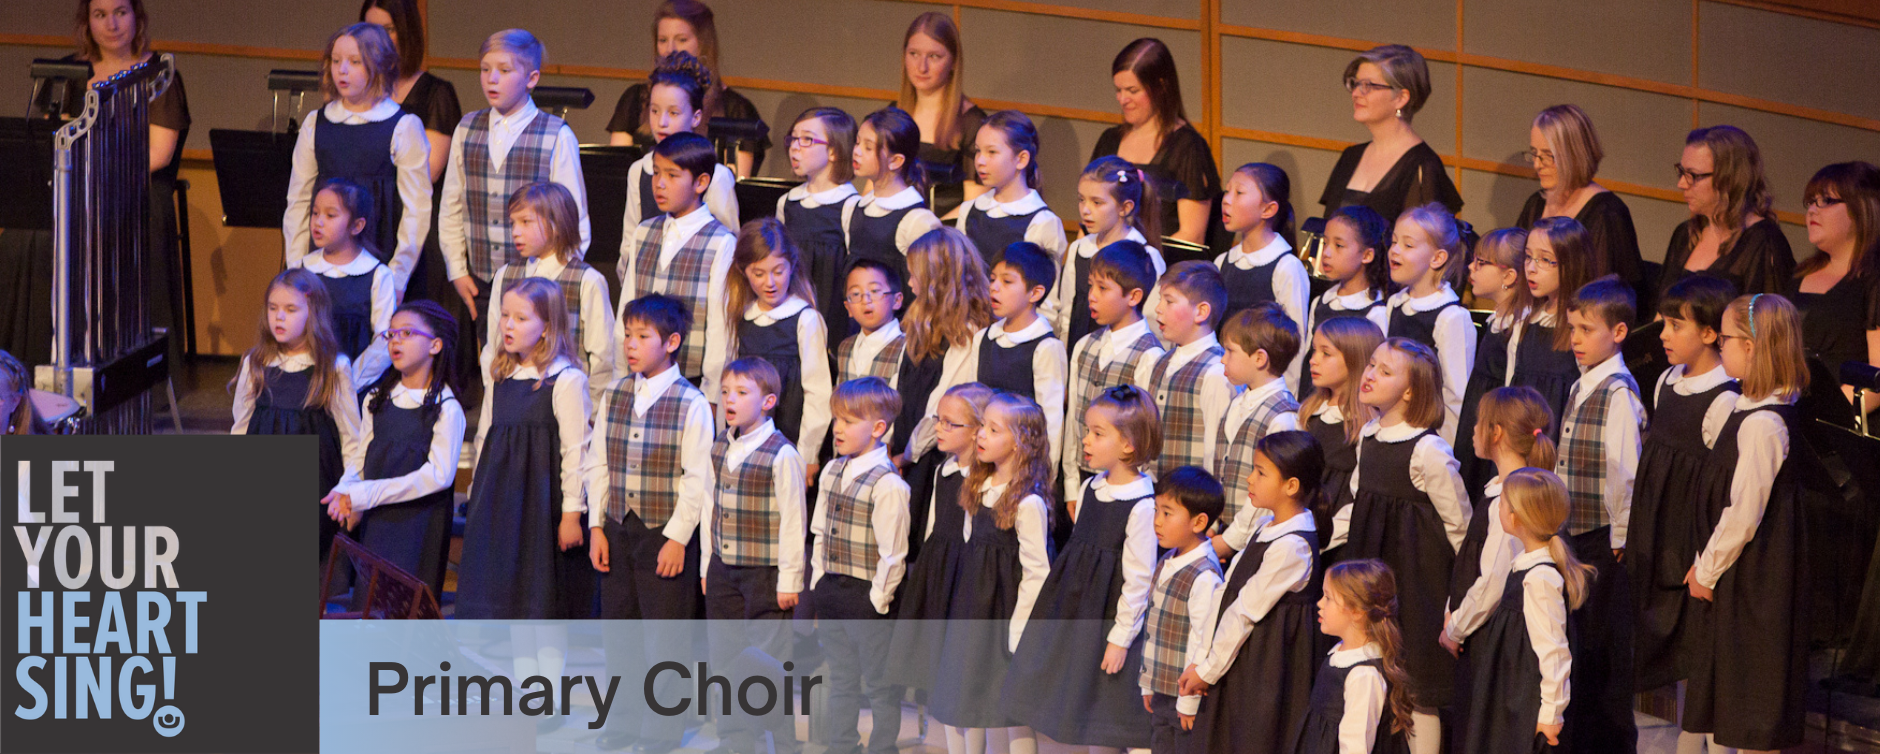 Primary Choir